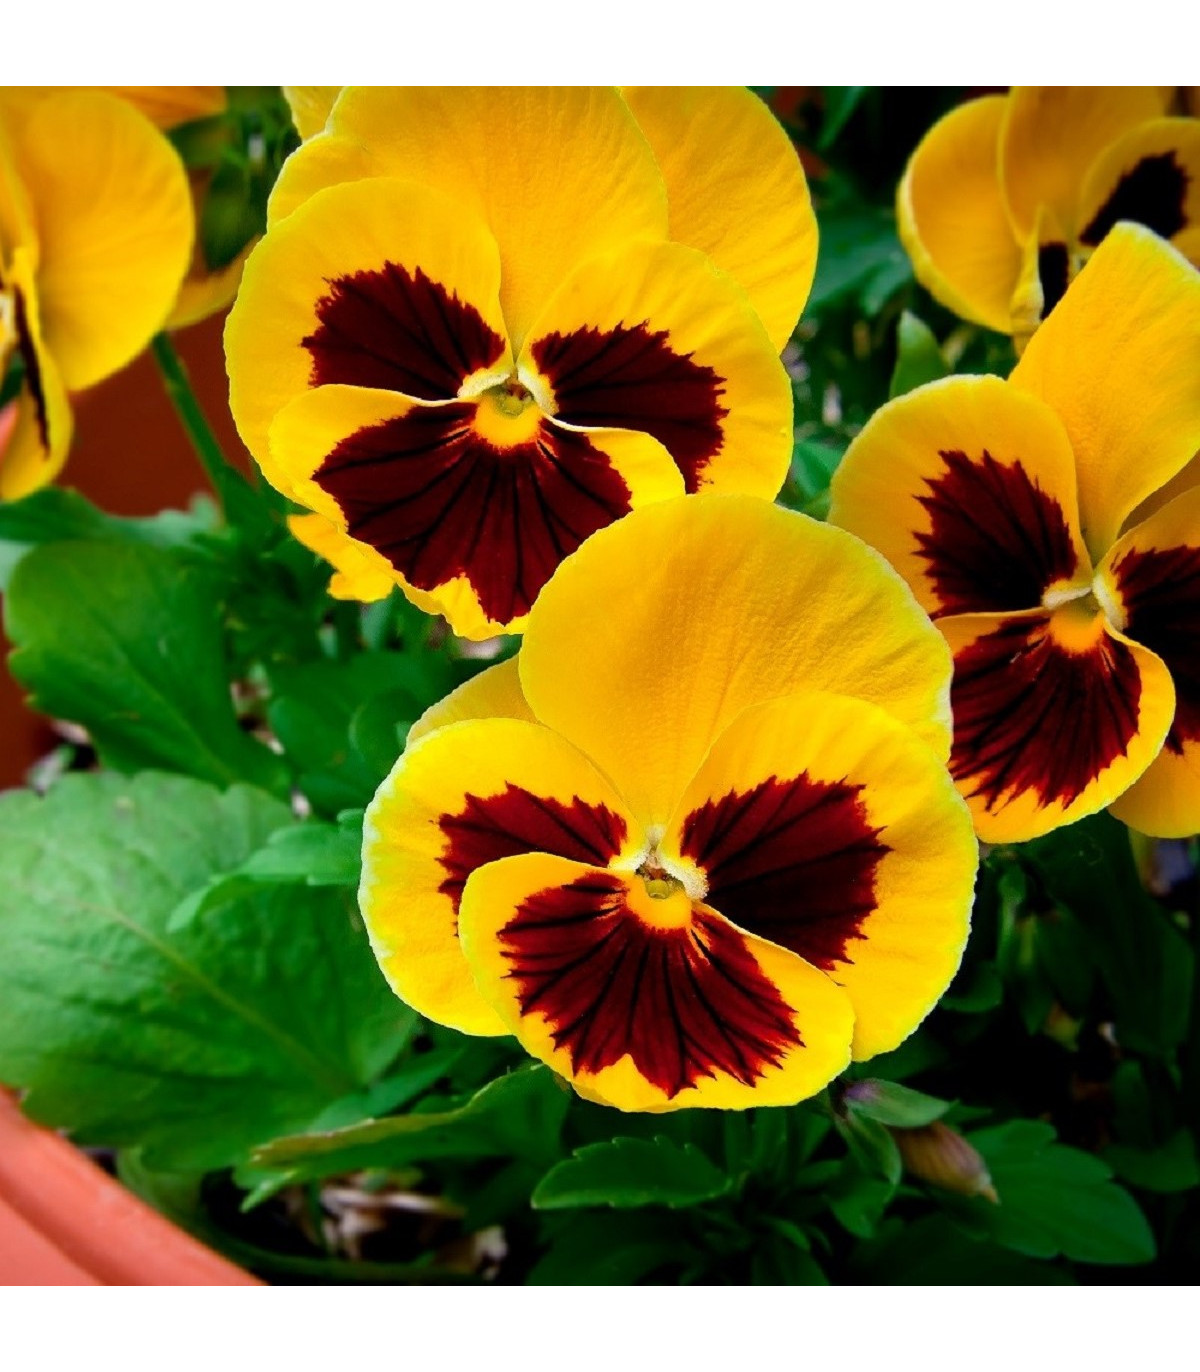 Maceška Zlatožlutá Firnengold - Viola wittrockiana - semena - 200 ks